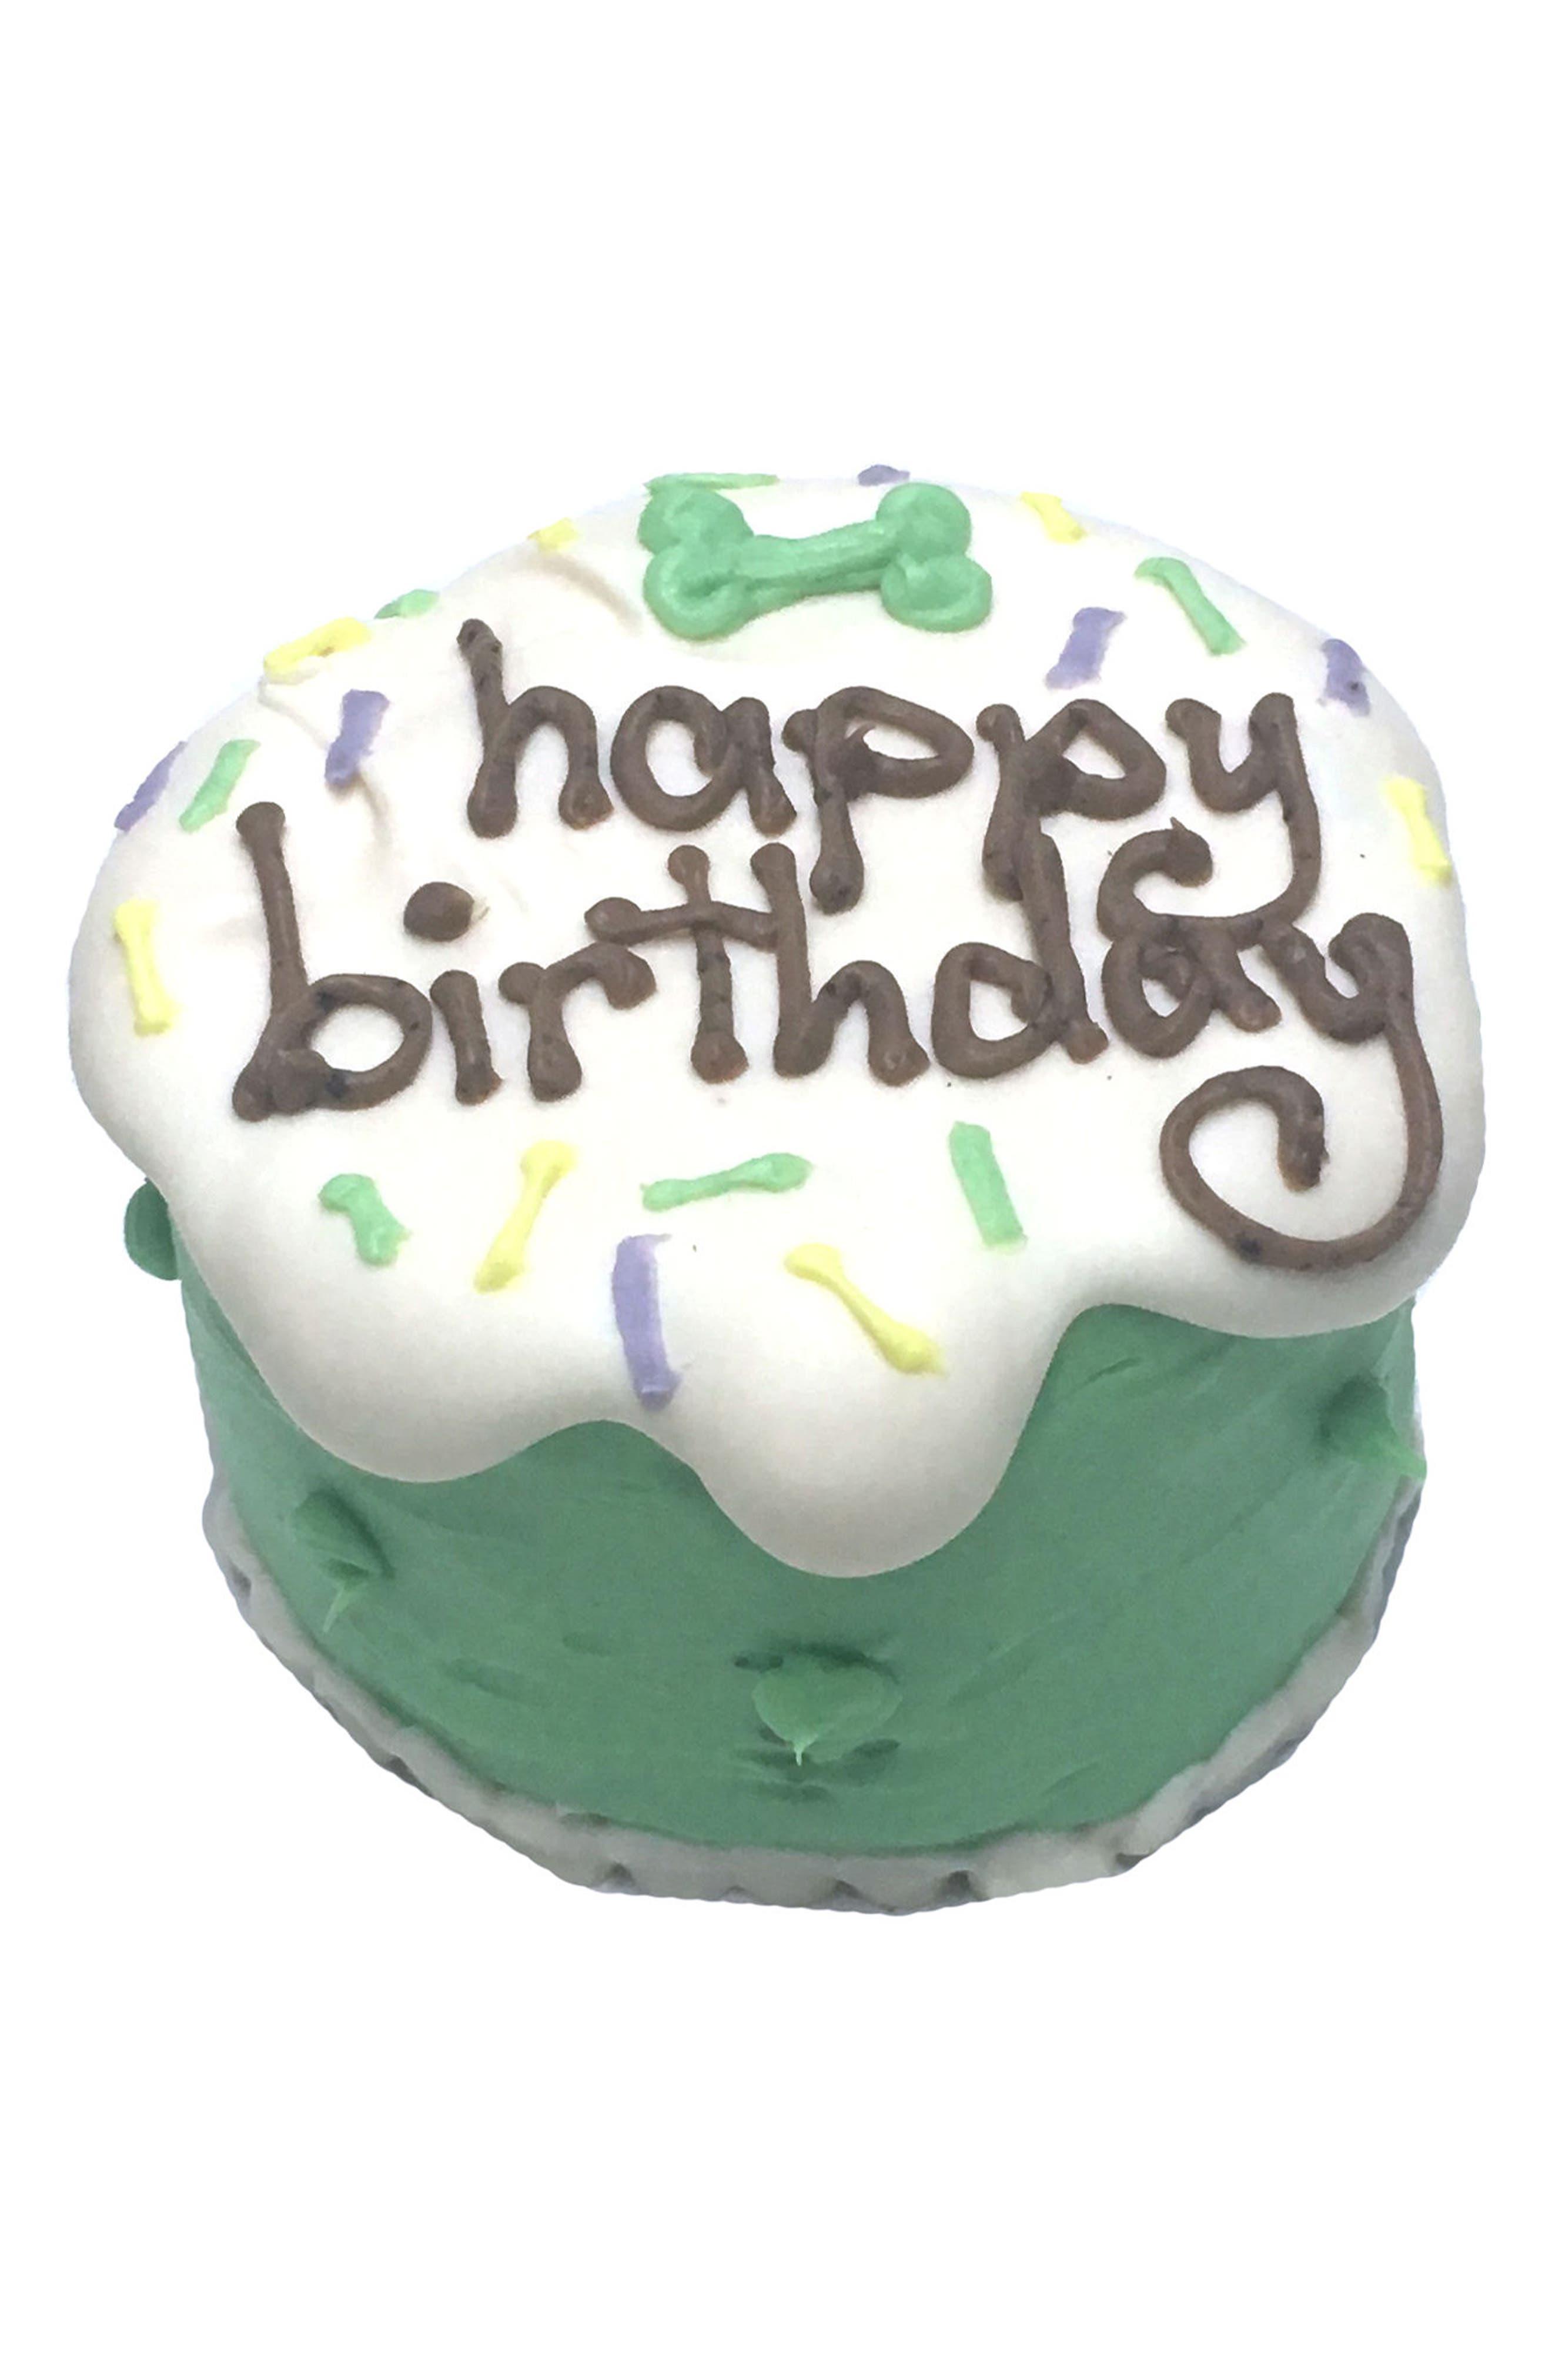 Main Image - Bubba Rose Biscuit Company Unisex Birthday Baby Cake Dog Treat